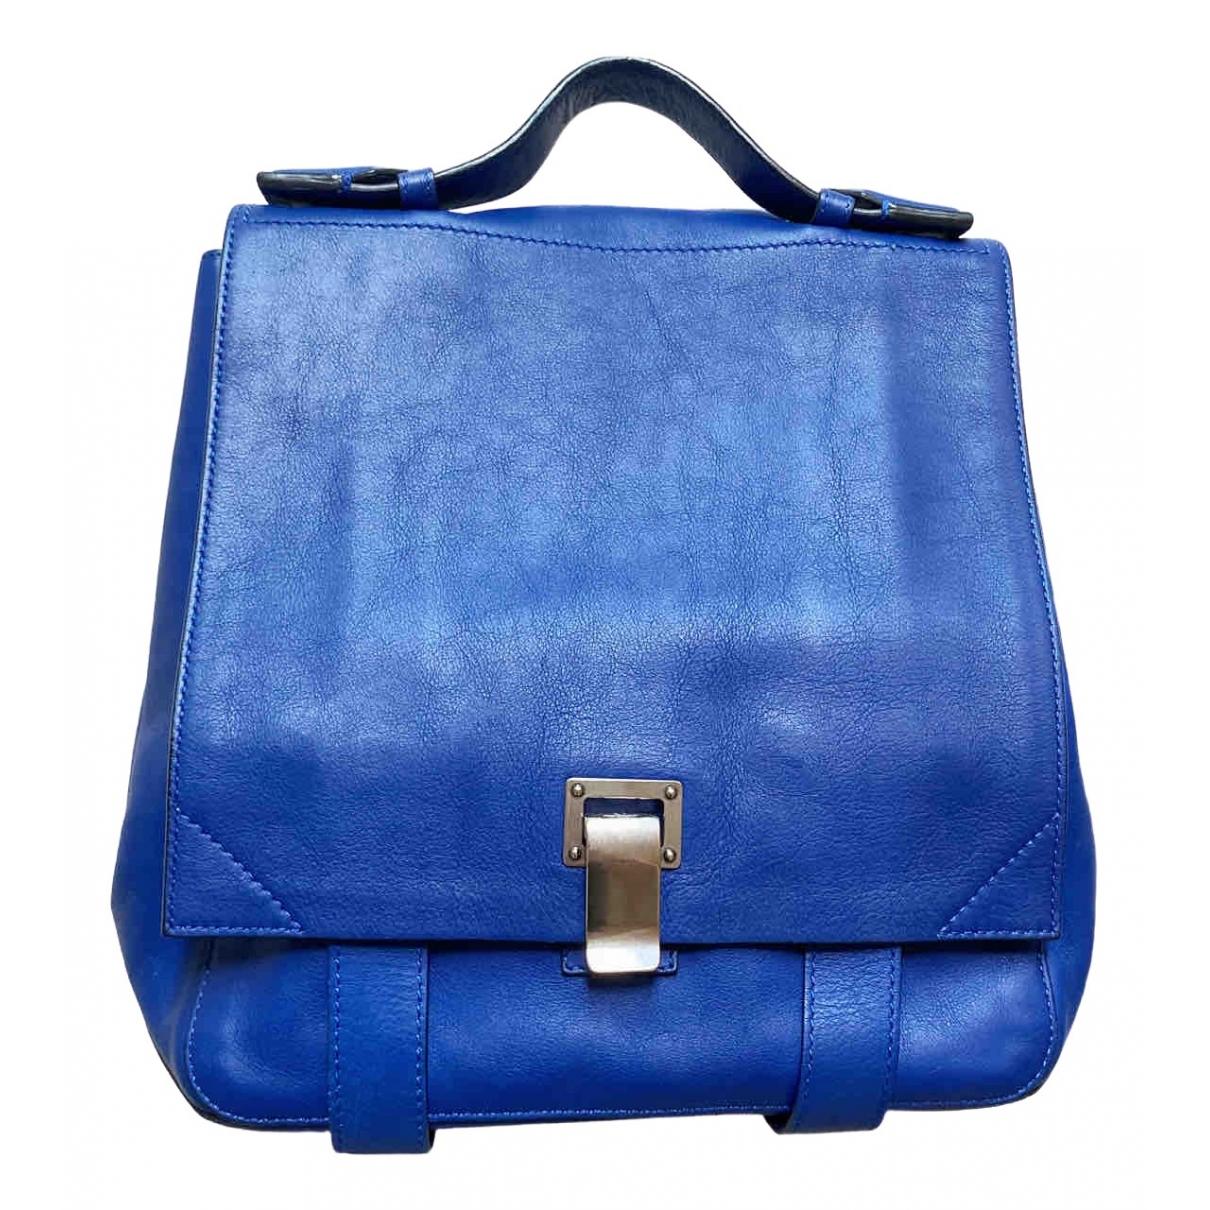 Proenza Schouler PS1 Backpack Rucksaecke in  Blau Leder